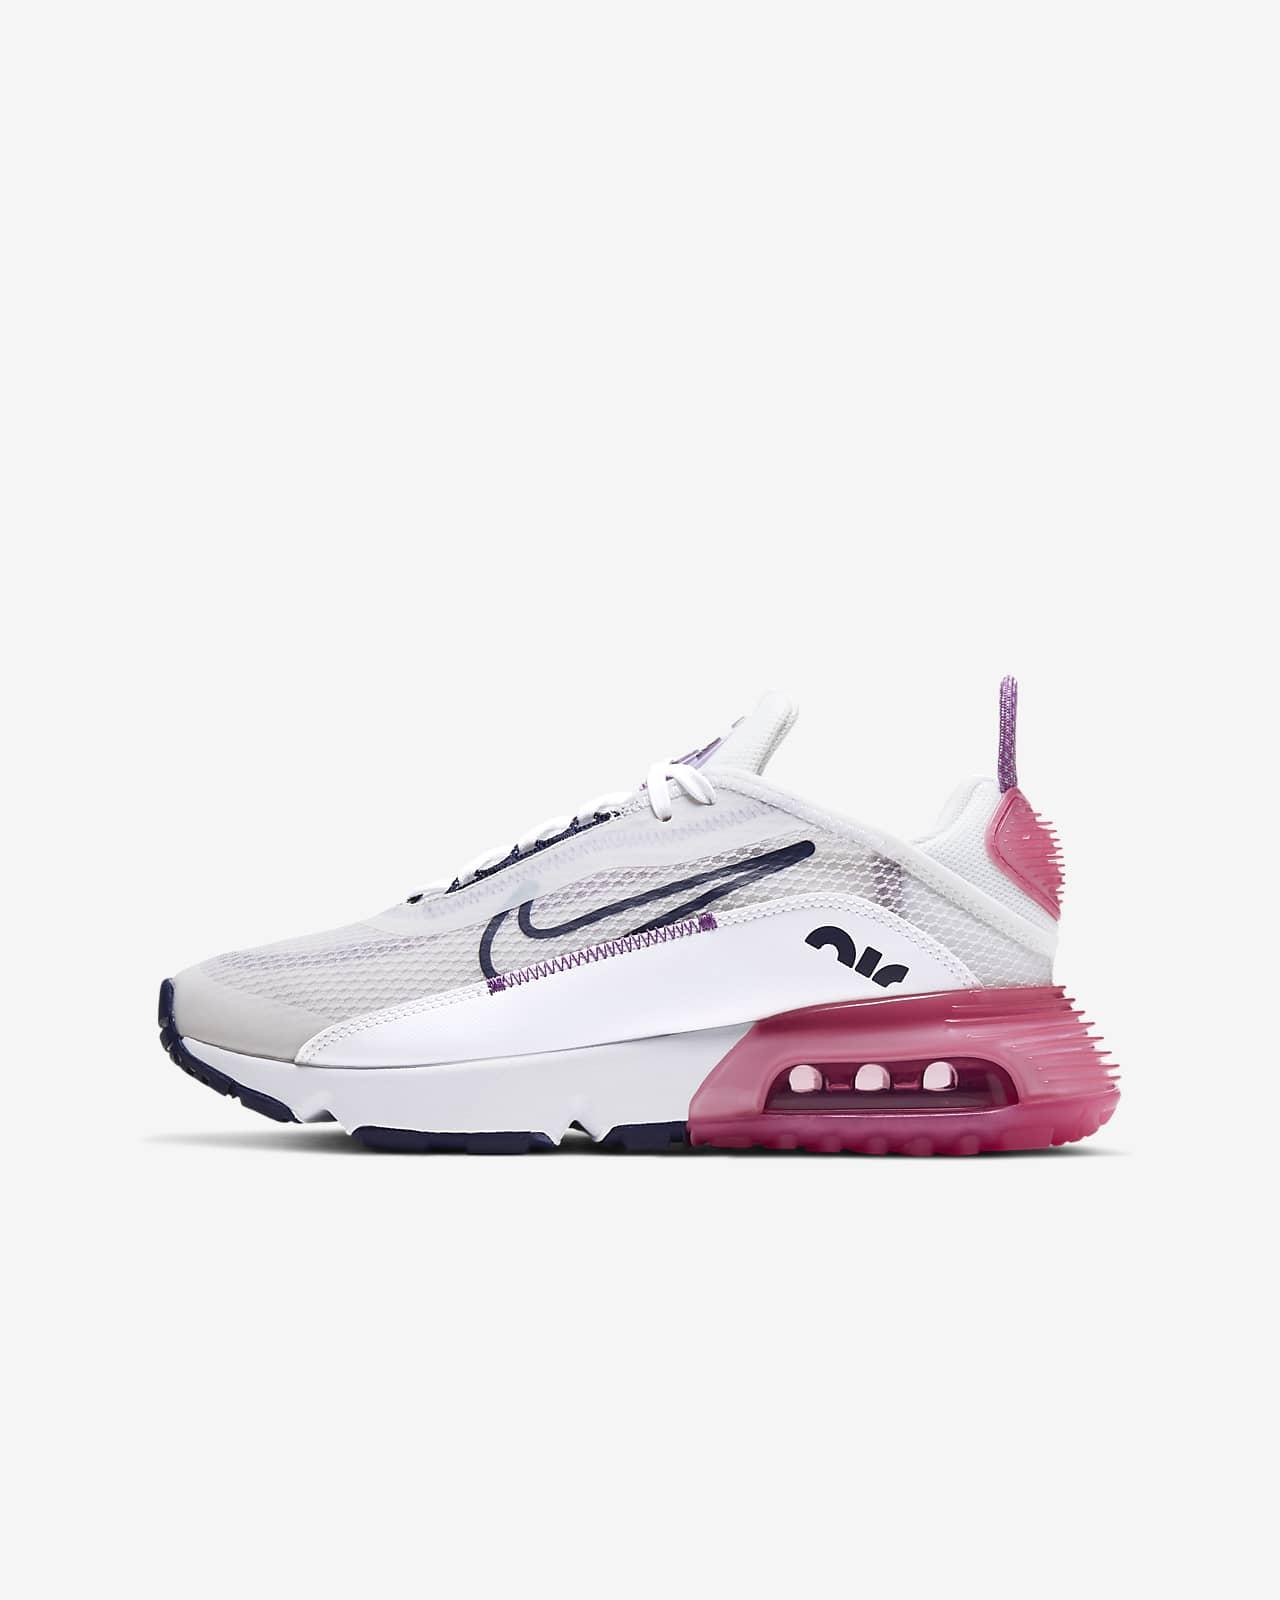 Nike Air Max 2090 Older Kids' Shoe. Nike LU